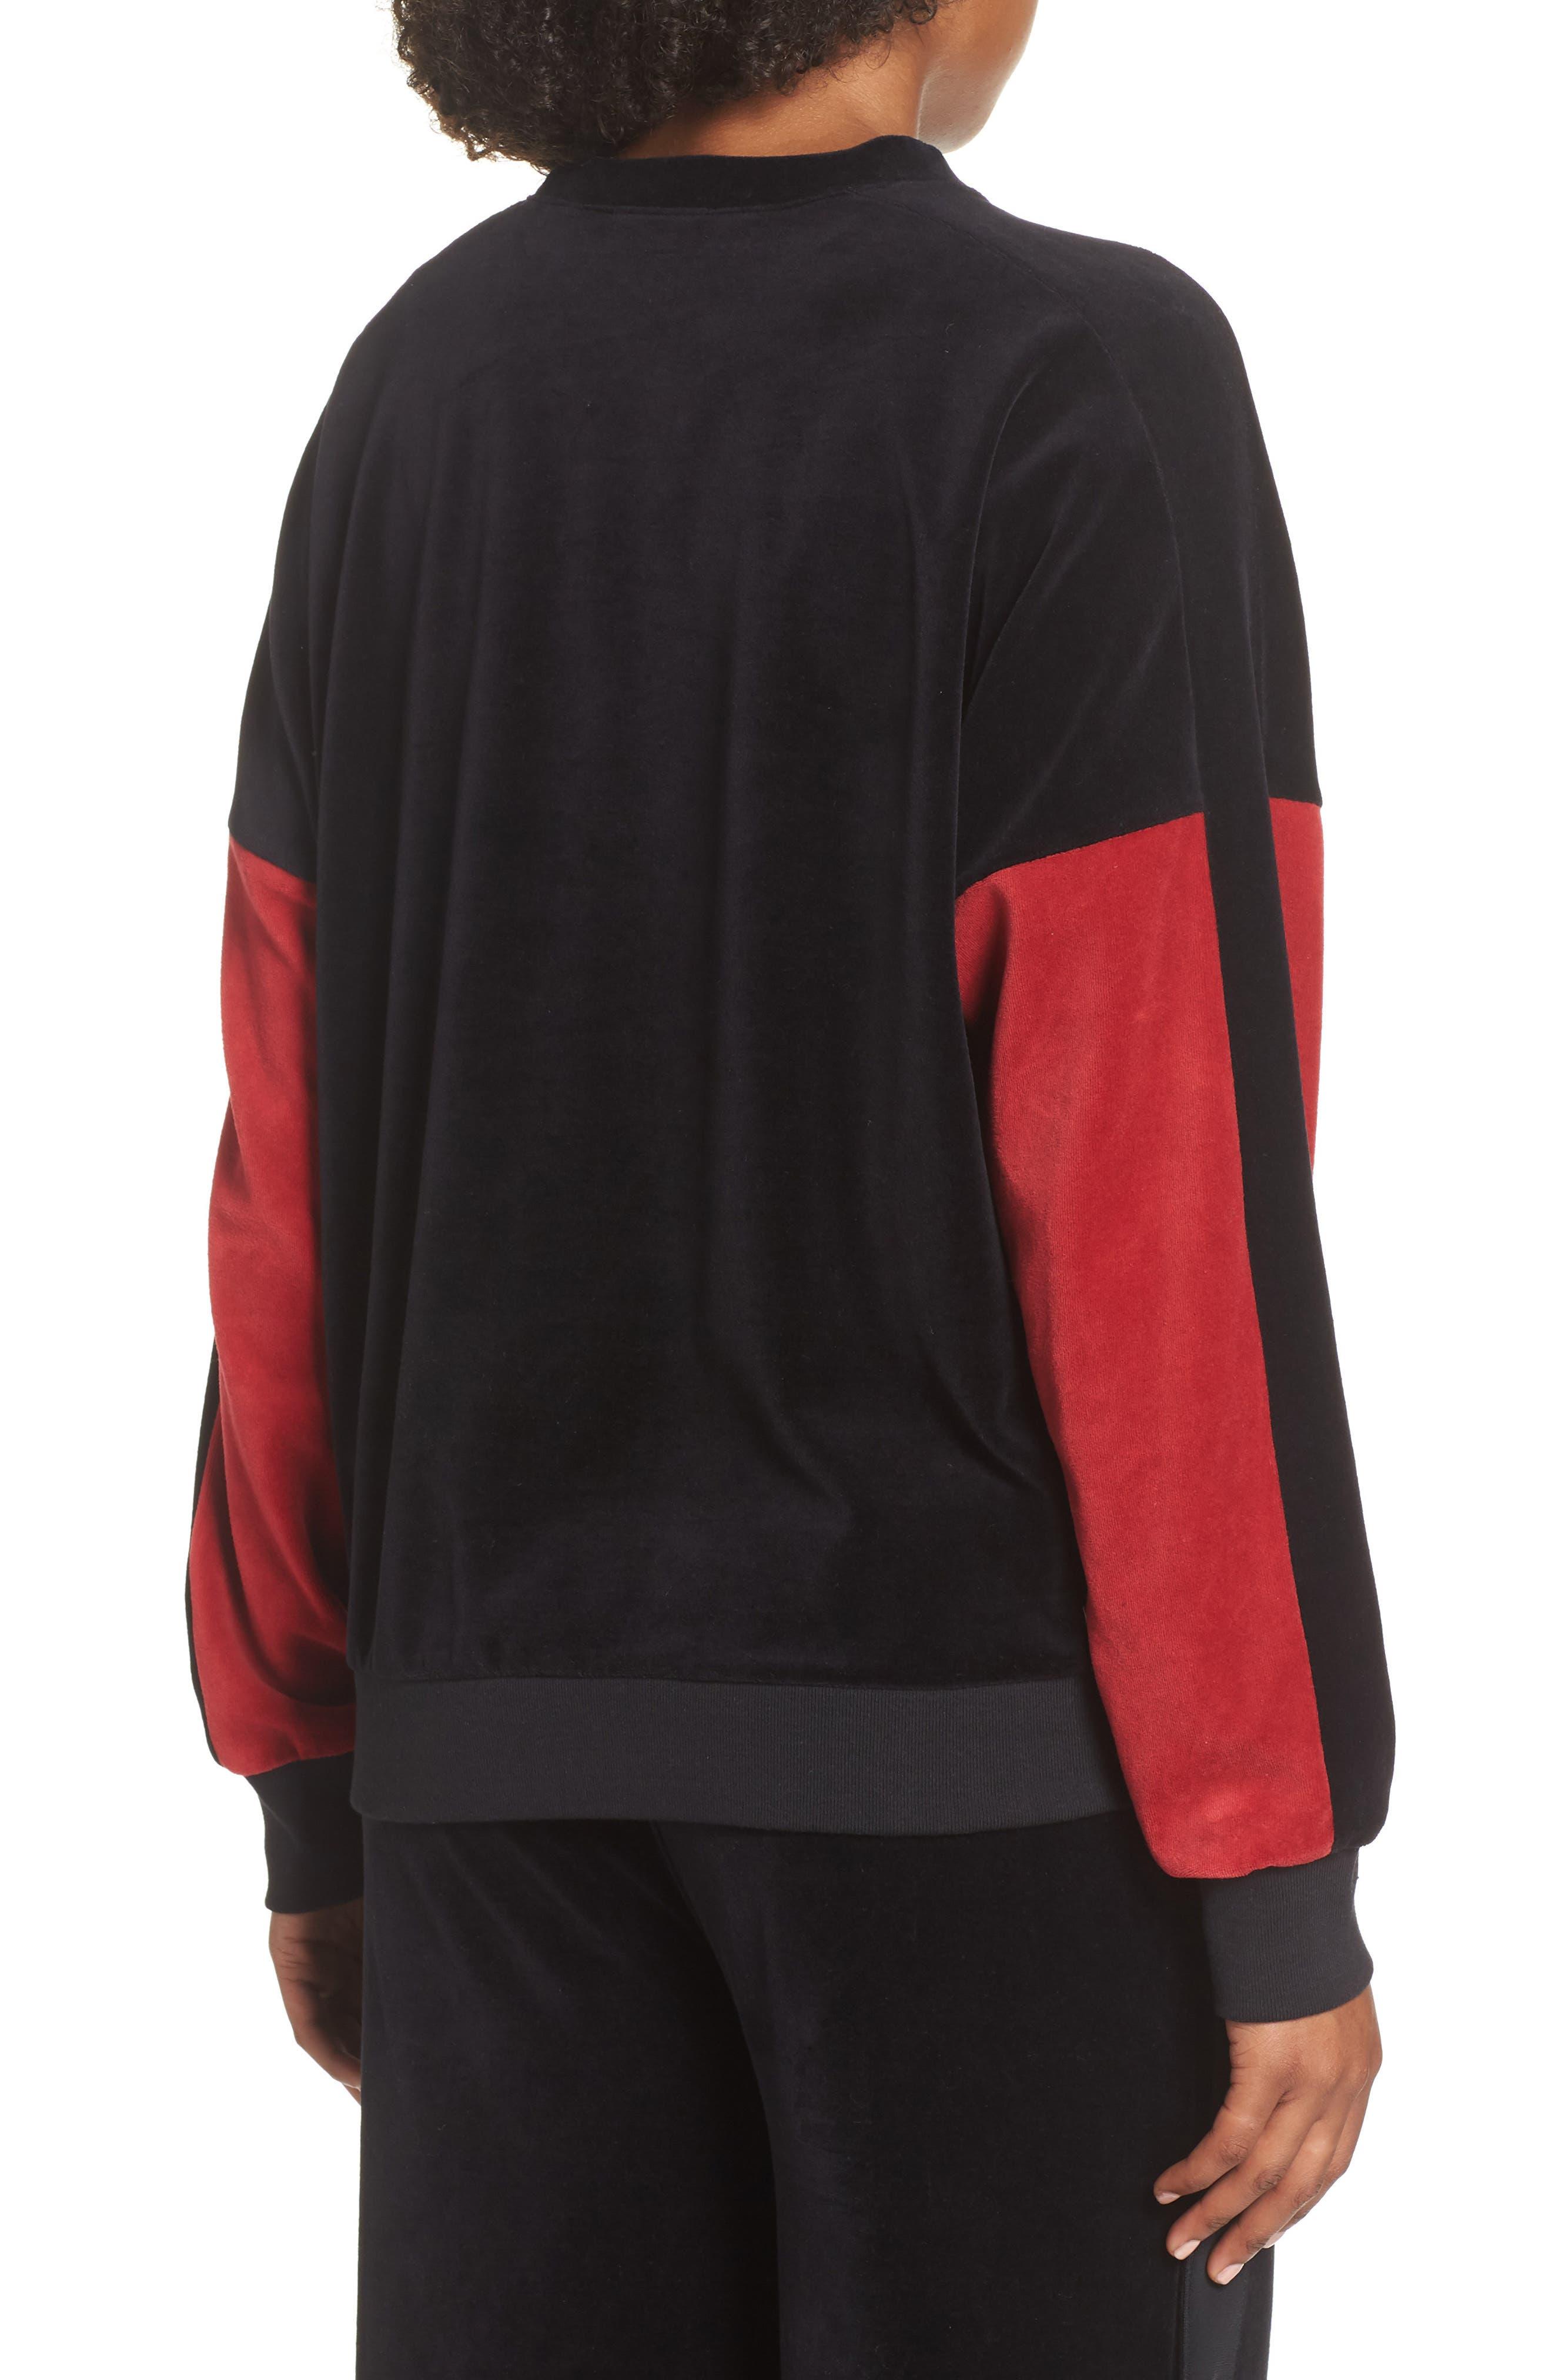 Velour Crewneck Sweater,                             Alternate thumbnail 2, color,                             BLACK/ CRIMSON